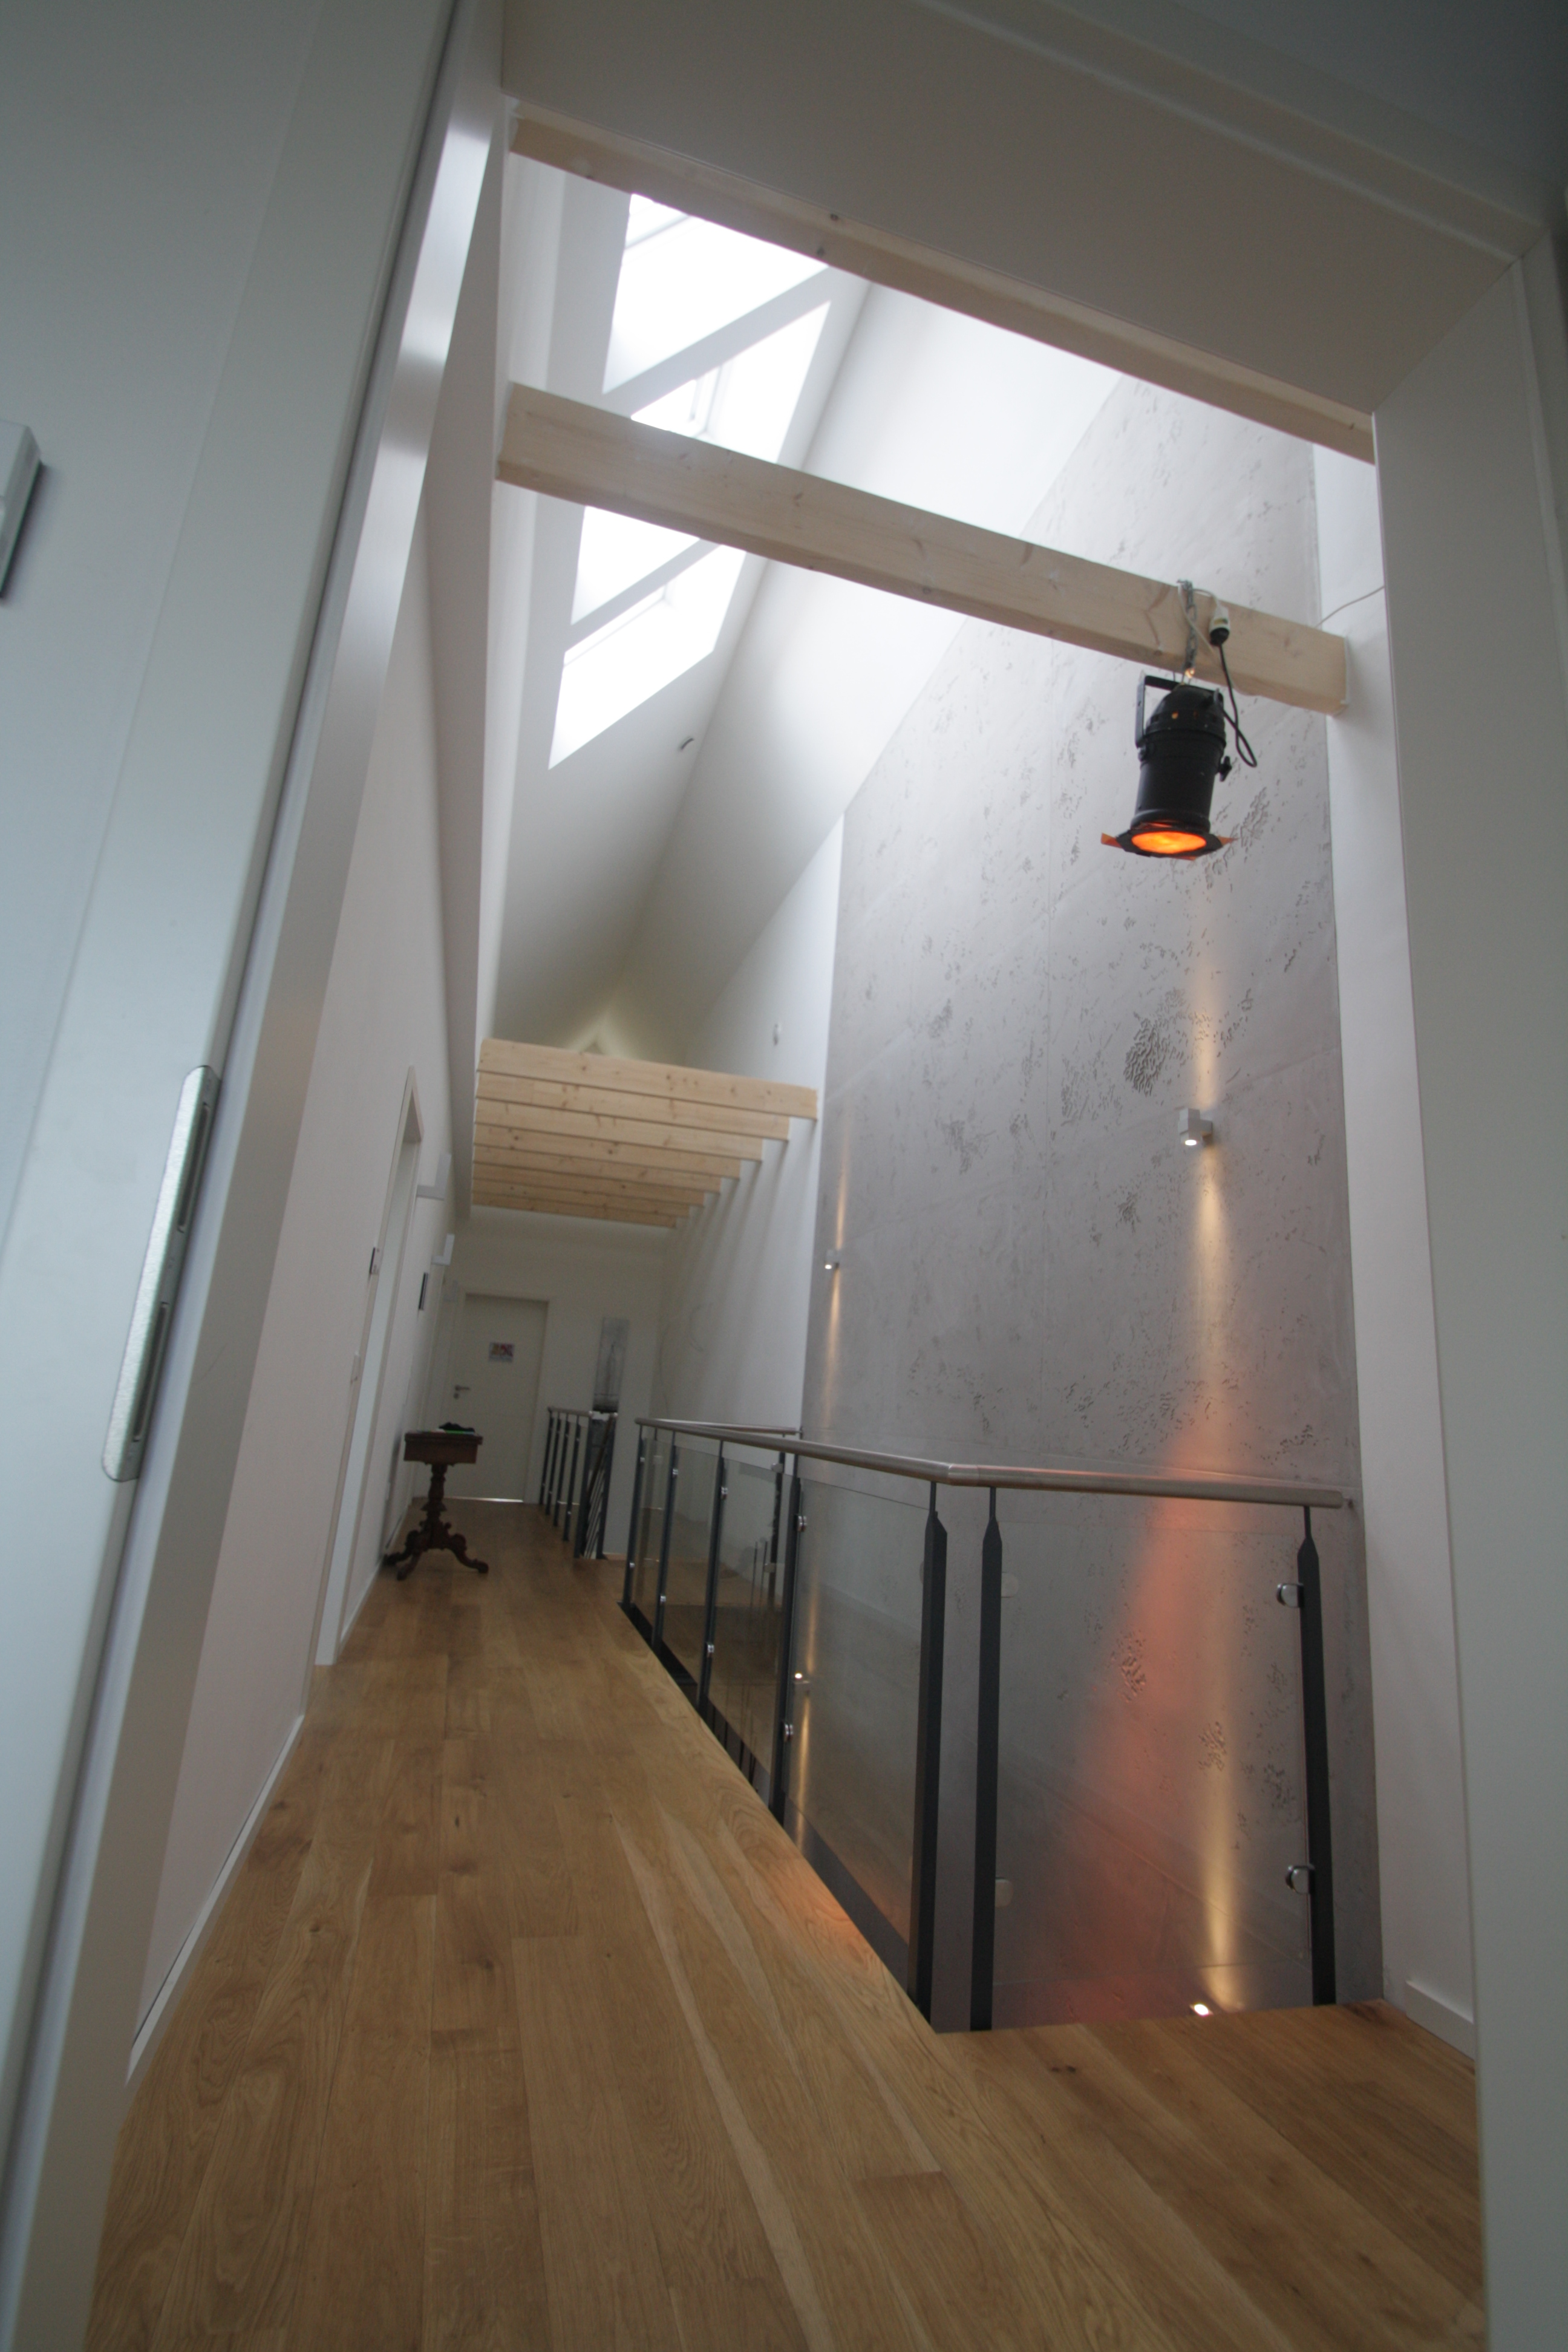 wandgestaltung in beton optik dein raumwerk. Black Bedroom Furniture Sets. Home Design Ideas